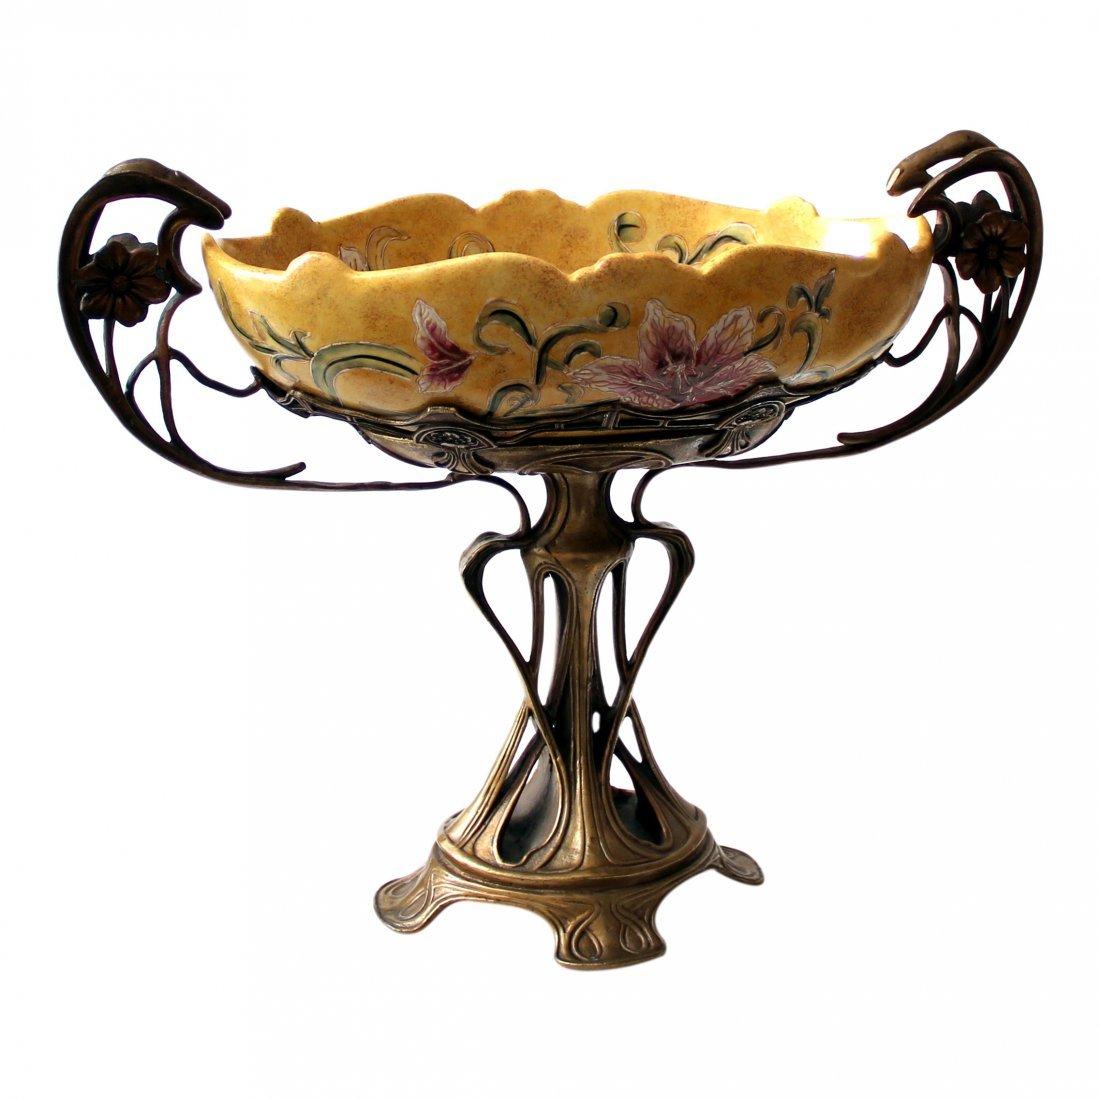 French Art Nouveau Centerpiece, Bronze, Majolica 19th C